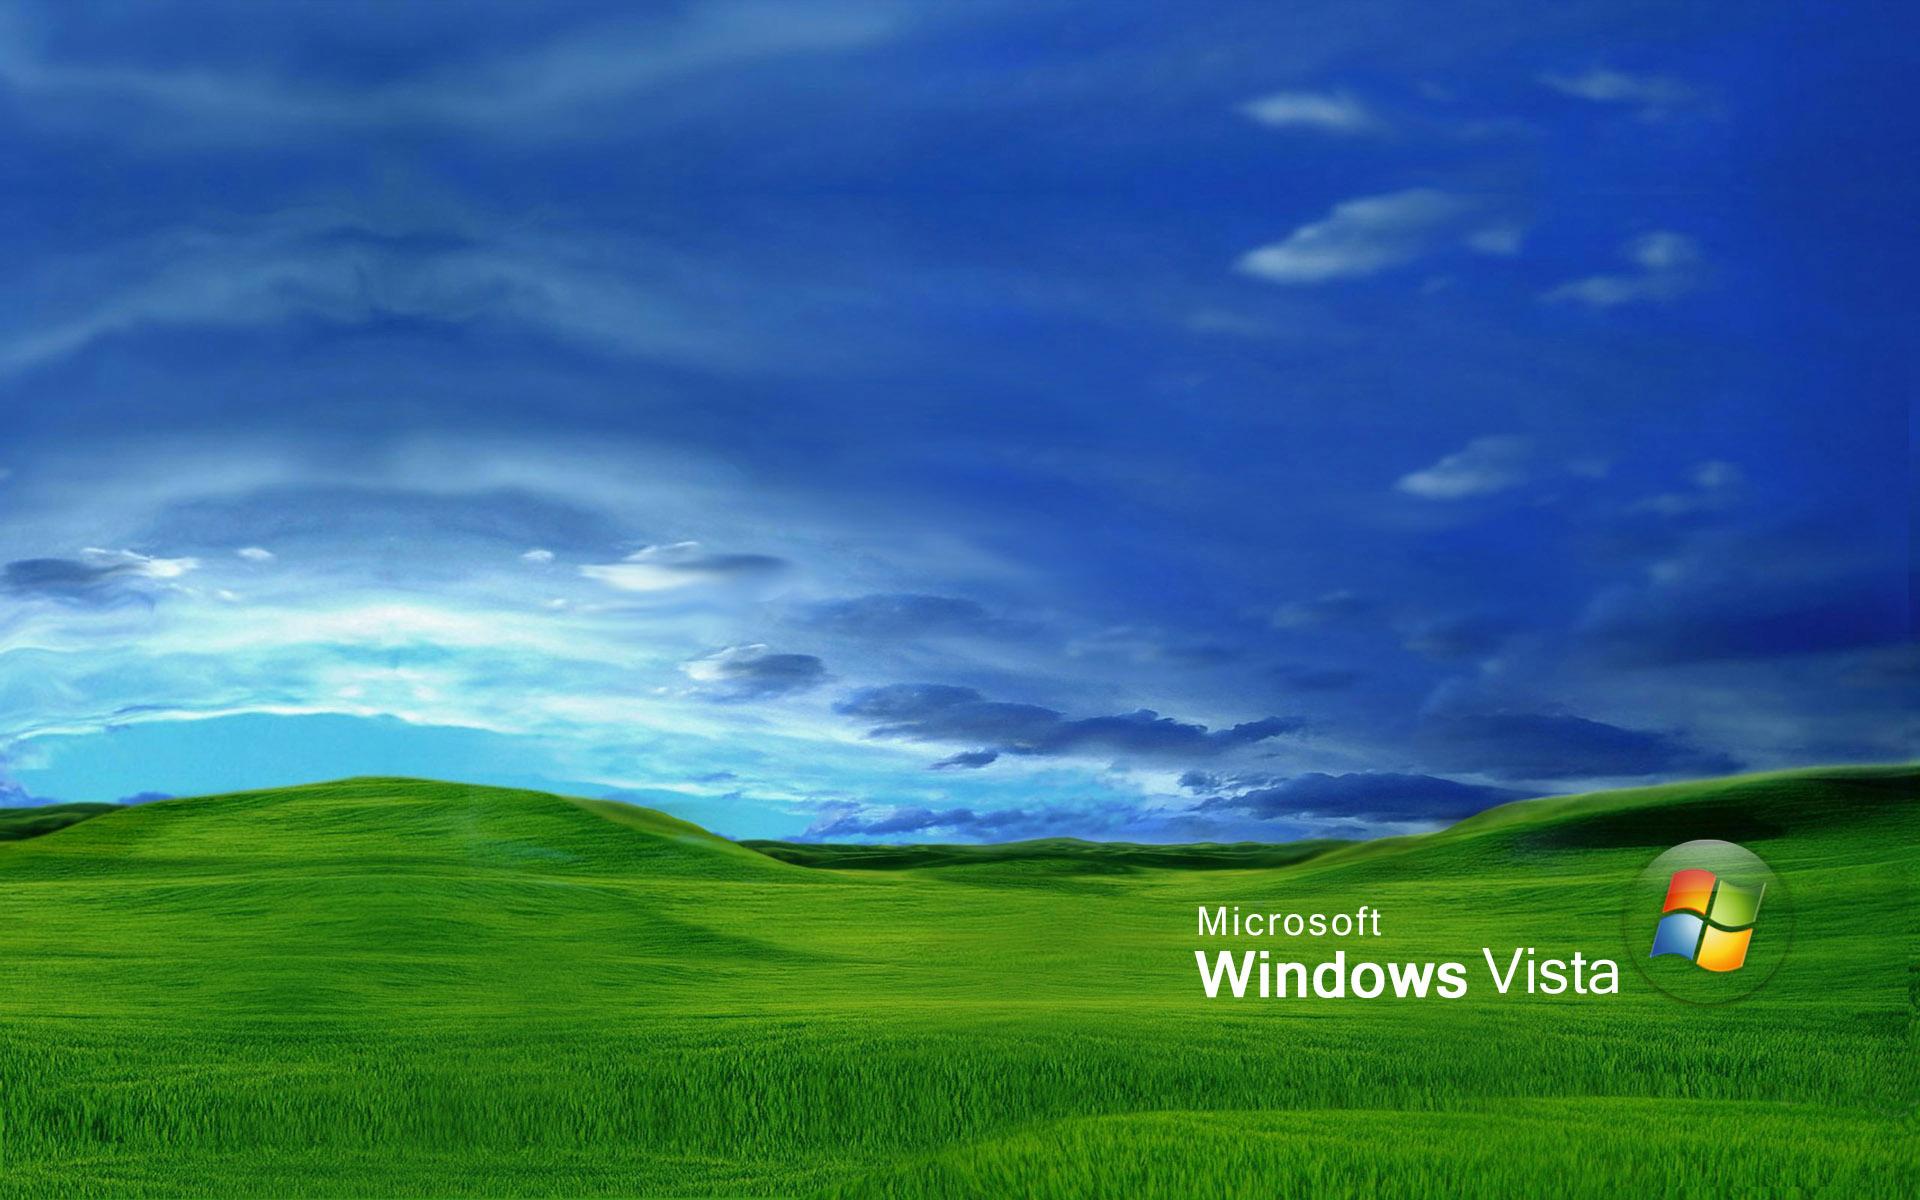 Windows Vista Wallpapers HD 1920 X 1200 38jpg Vista Wallpaper 94jpg 1920x1200